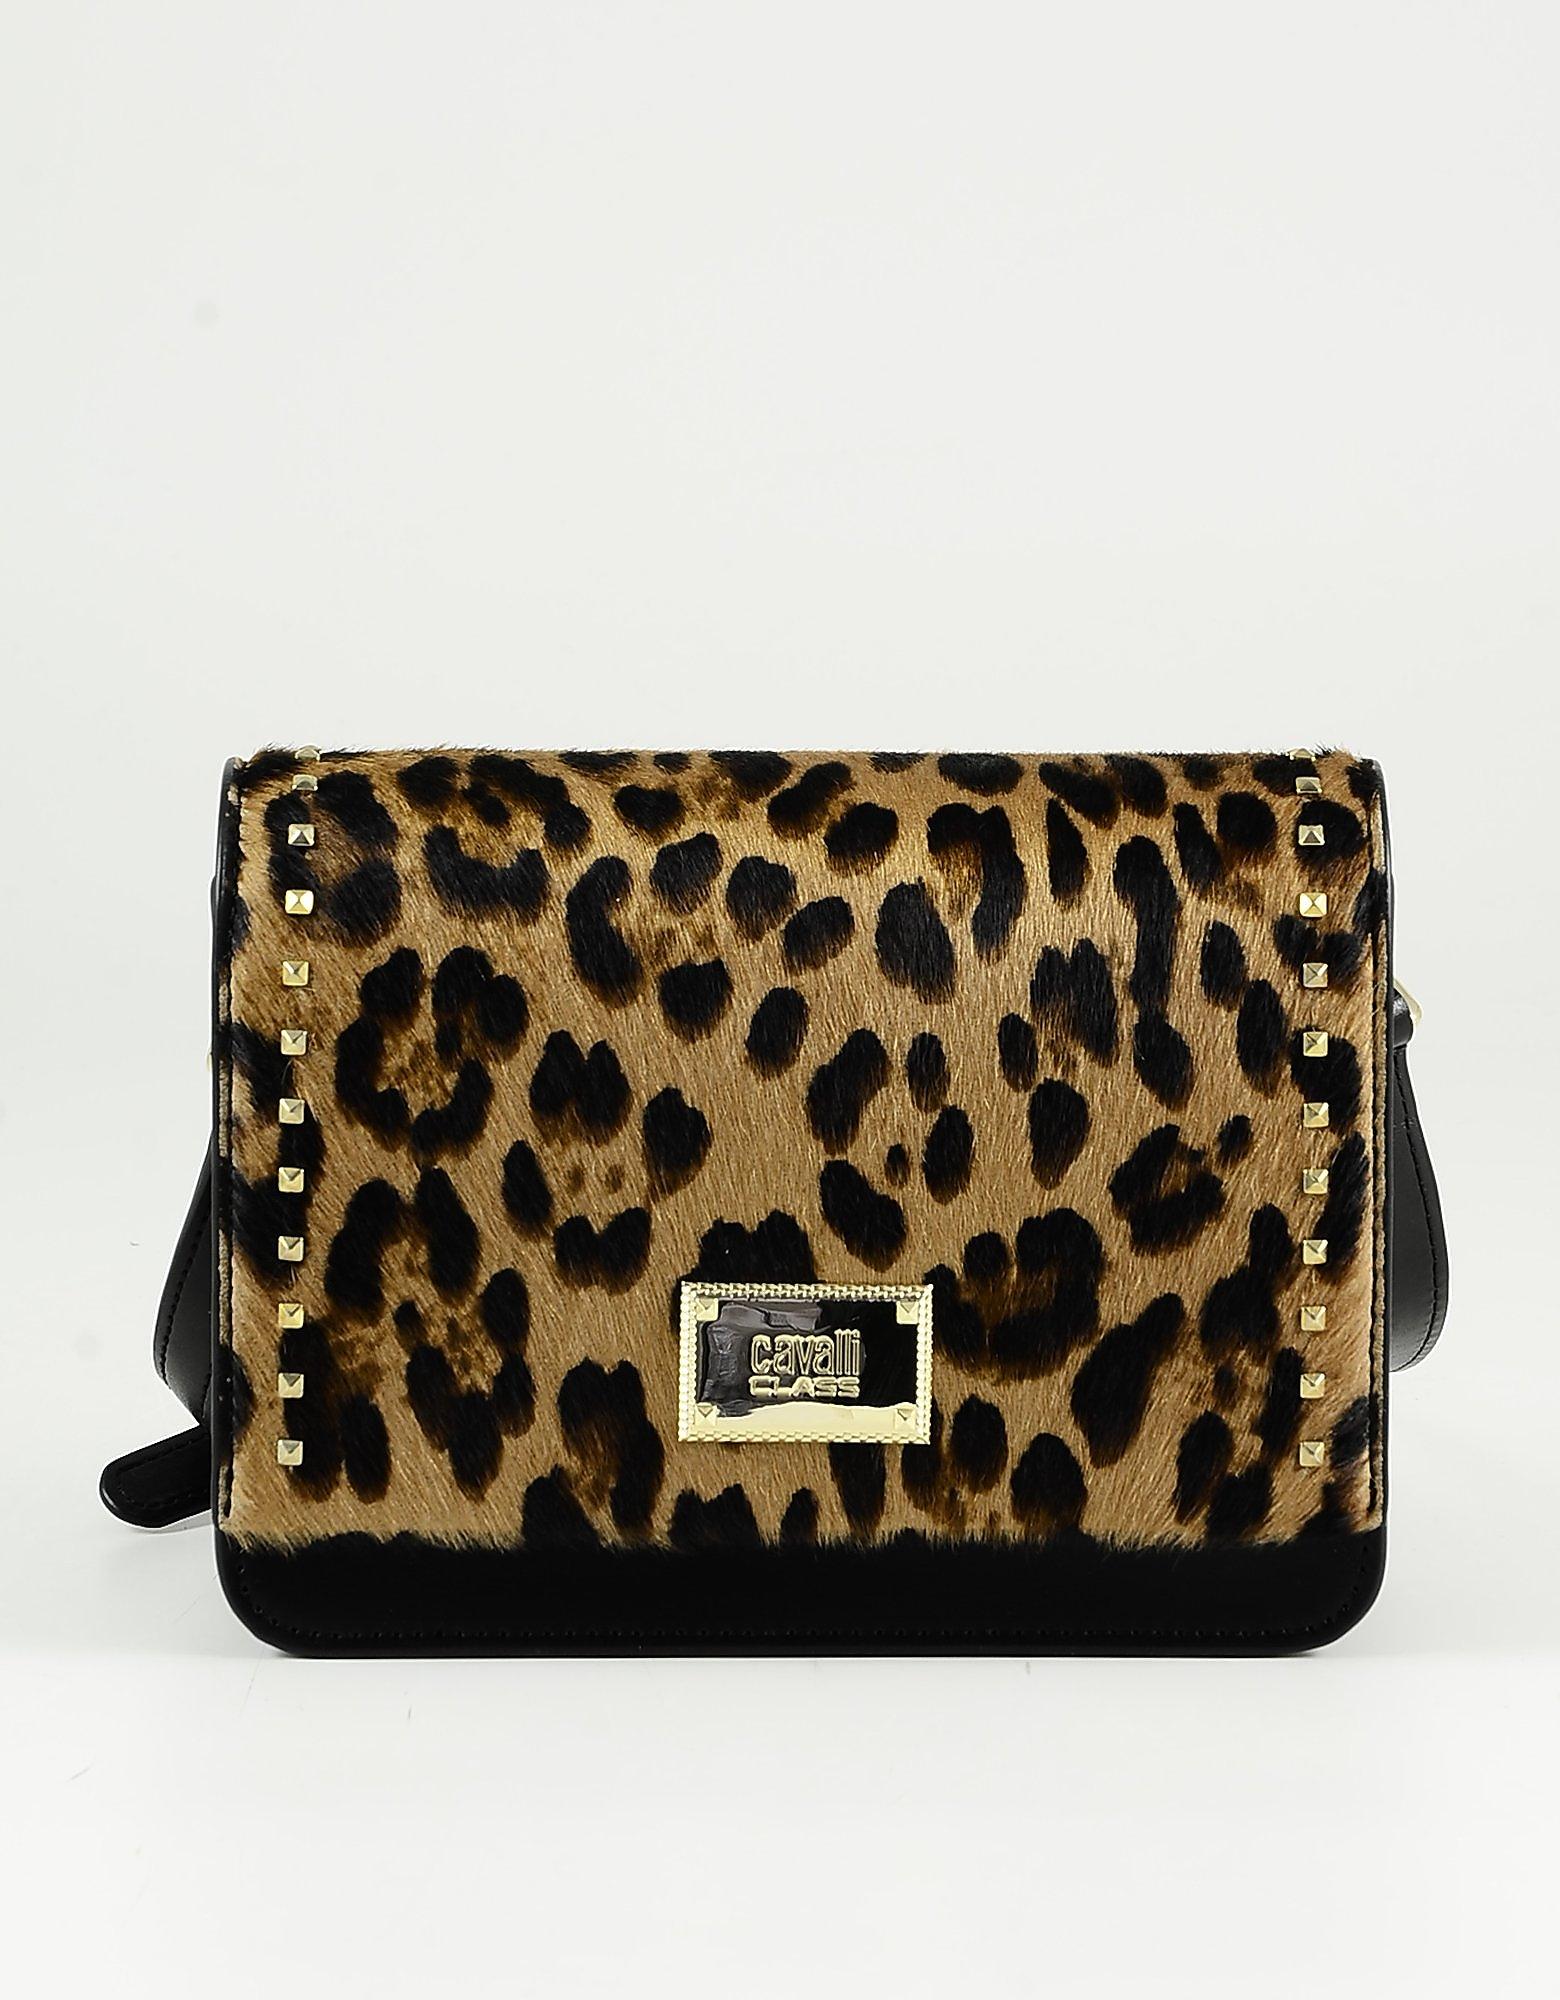 Class Roberto Cavalli Designer Handbags, Animal Print Hair Calf and Black Leather Shoulder Bag